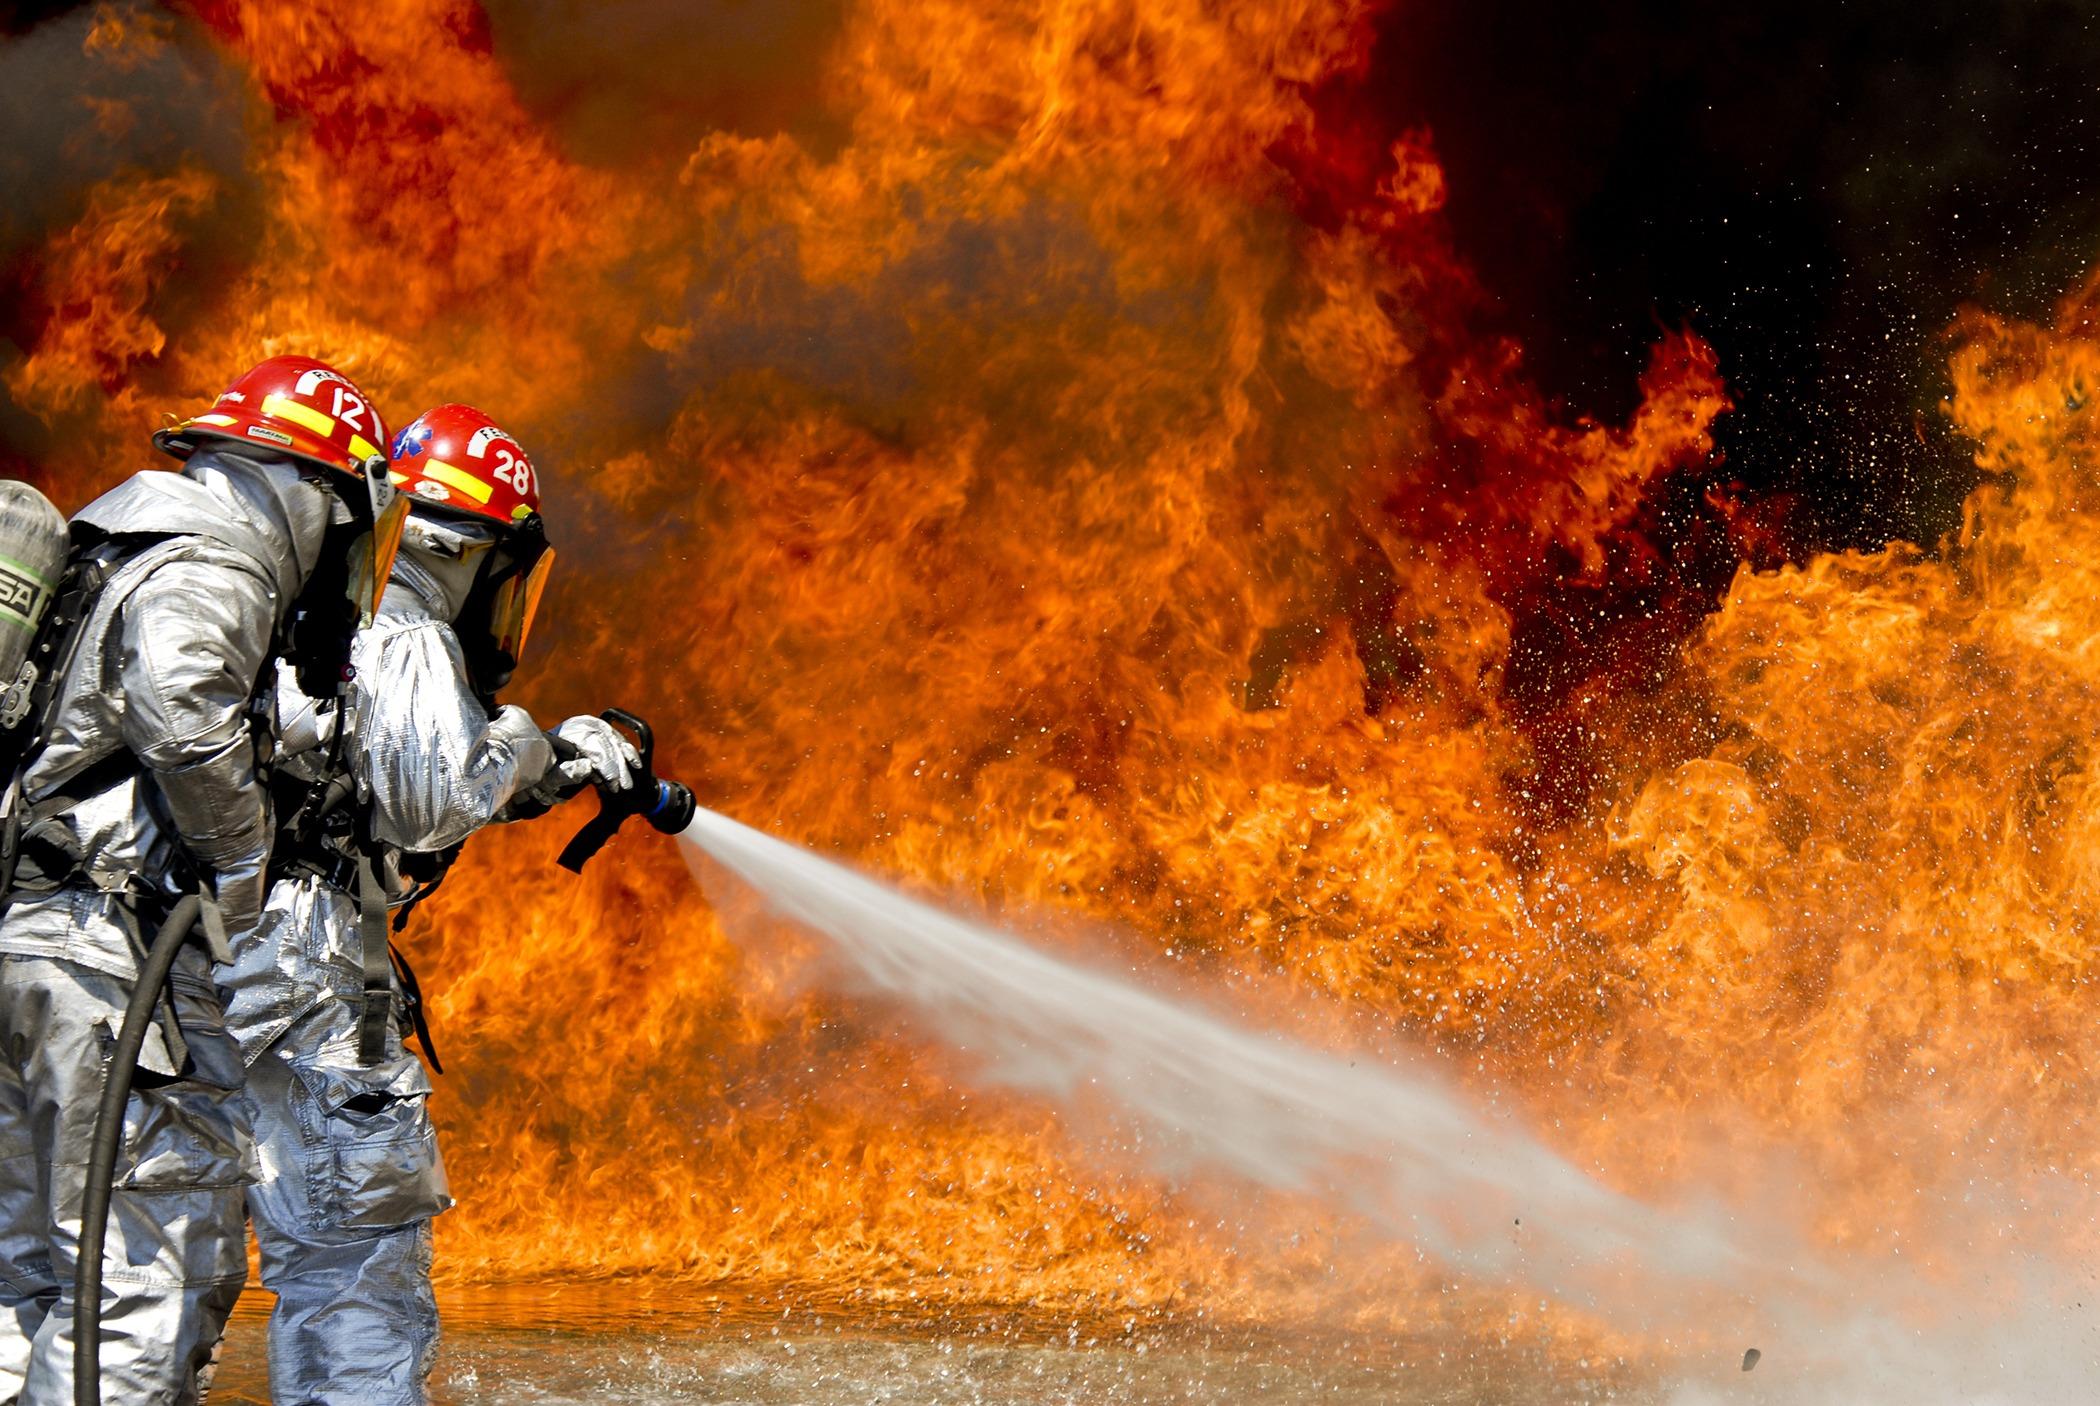 Photo of a 2 Fireman Killing a Huge Fire